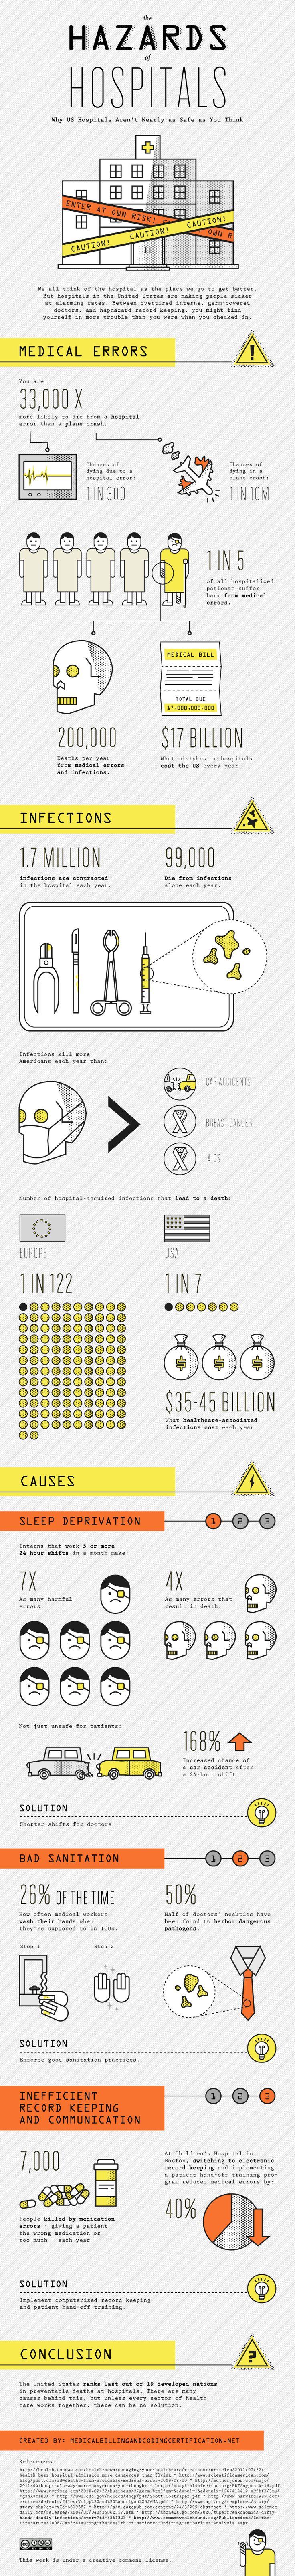 The hazards of hospitals